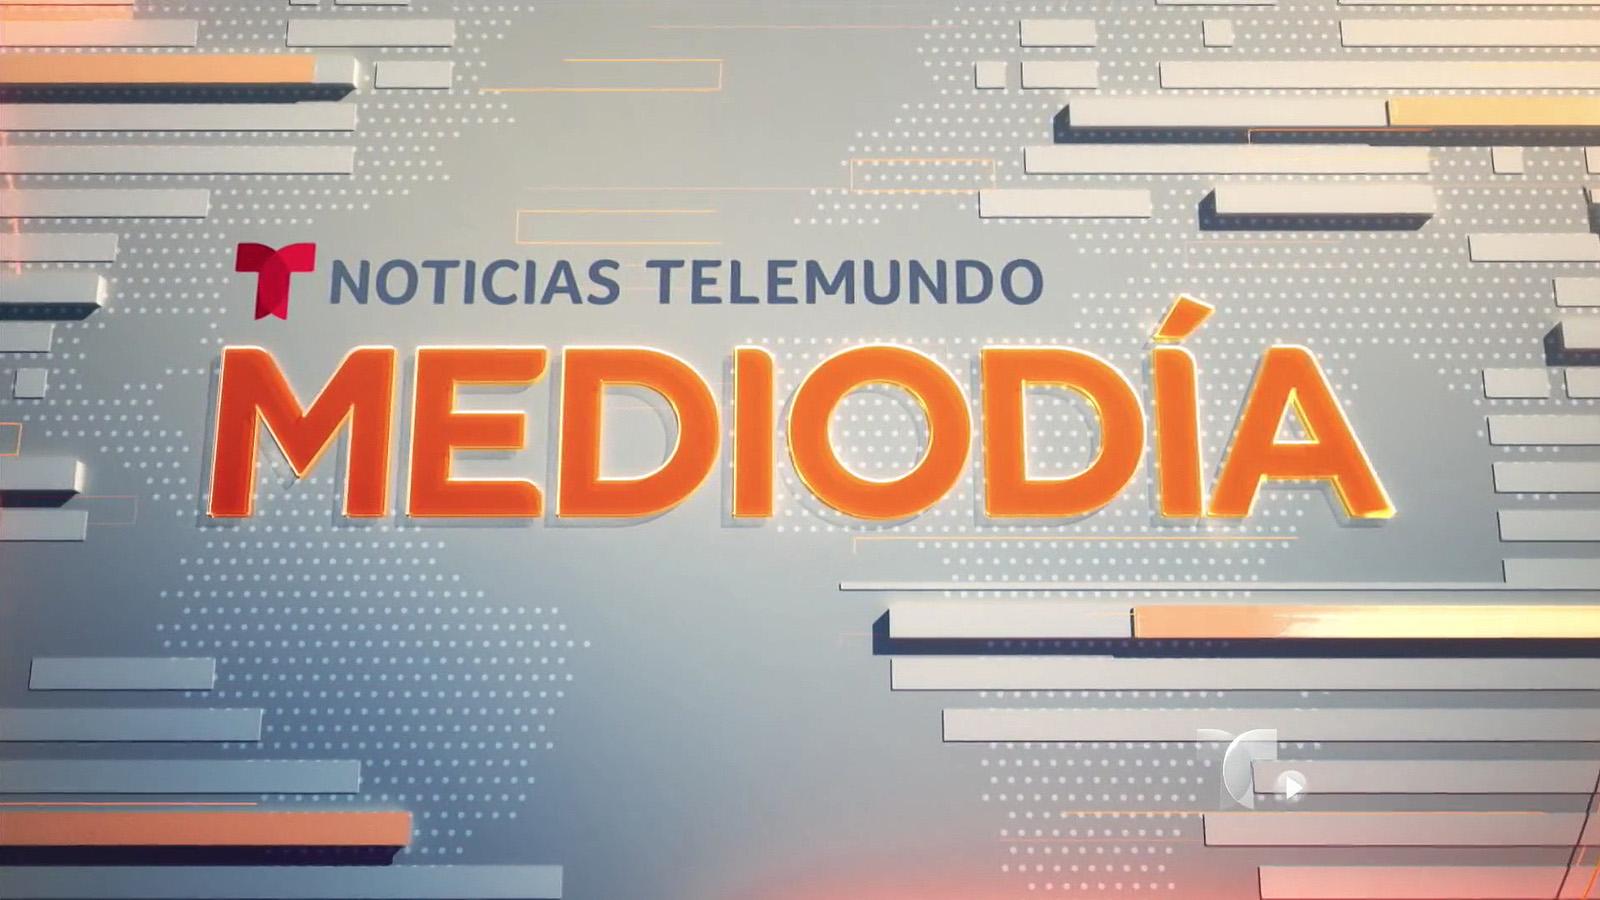 NCS_Noticias-Telemundo-Design_0020